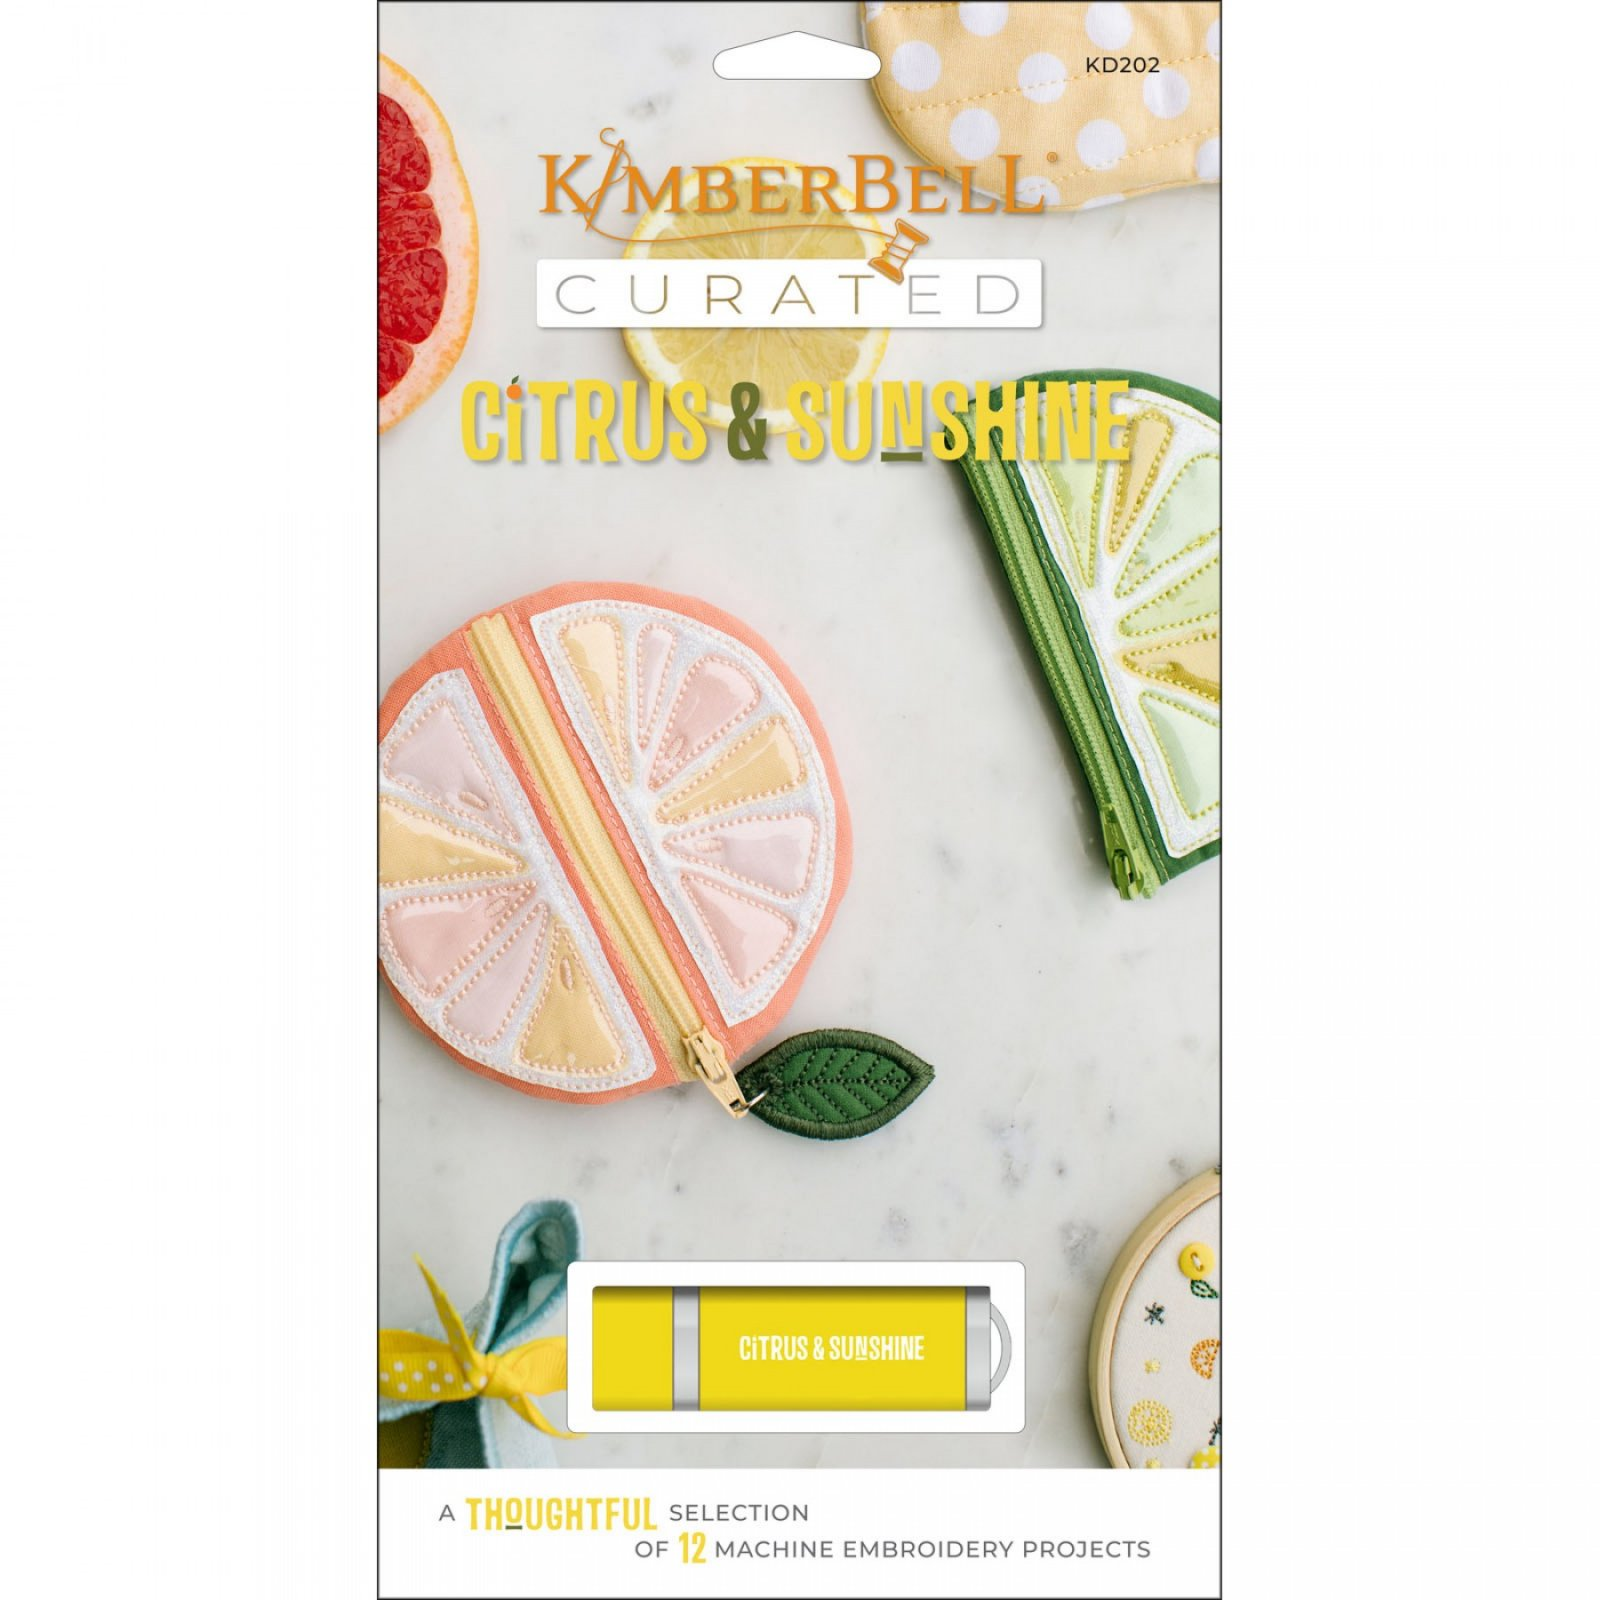 Kimberbell Curated: Citrus & Sunshine